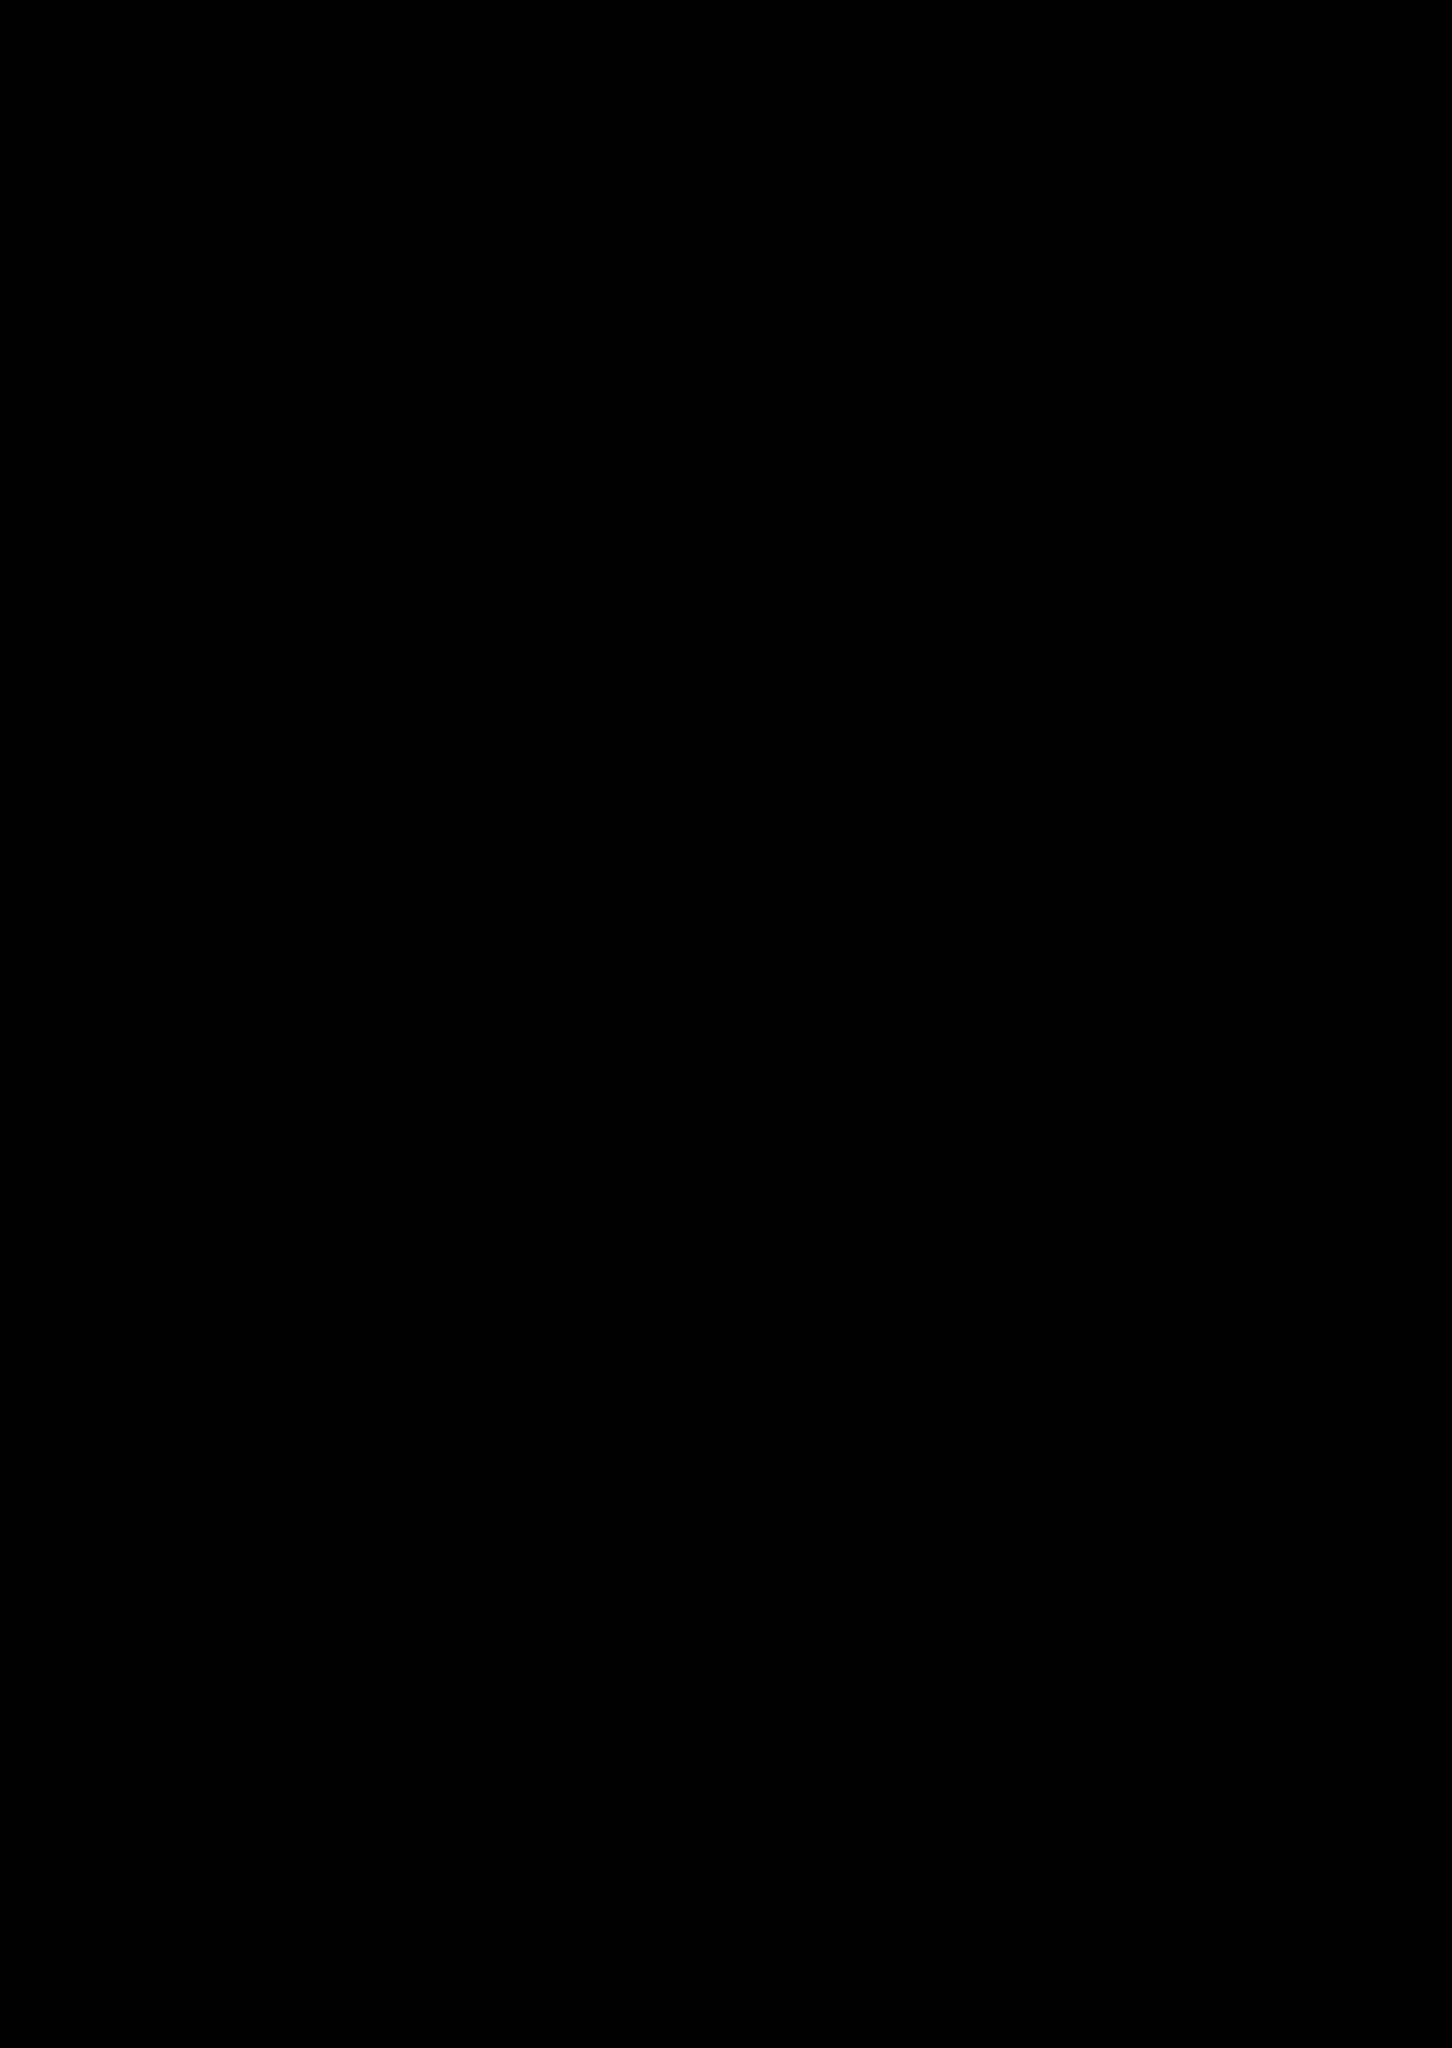 number png image. 4 clipart transparent